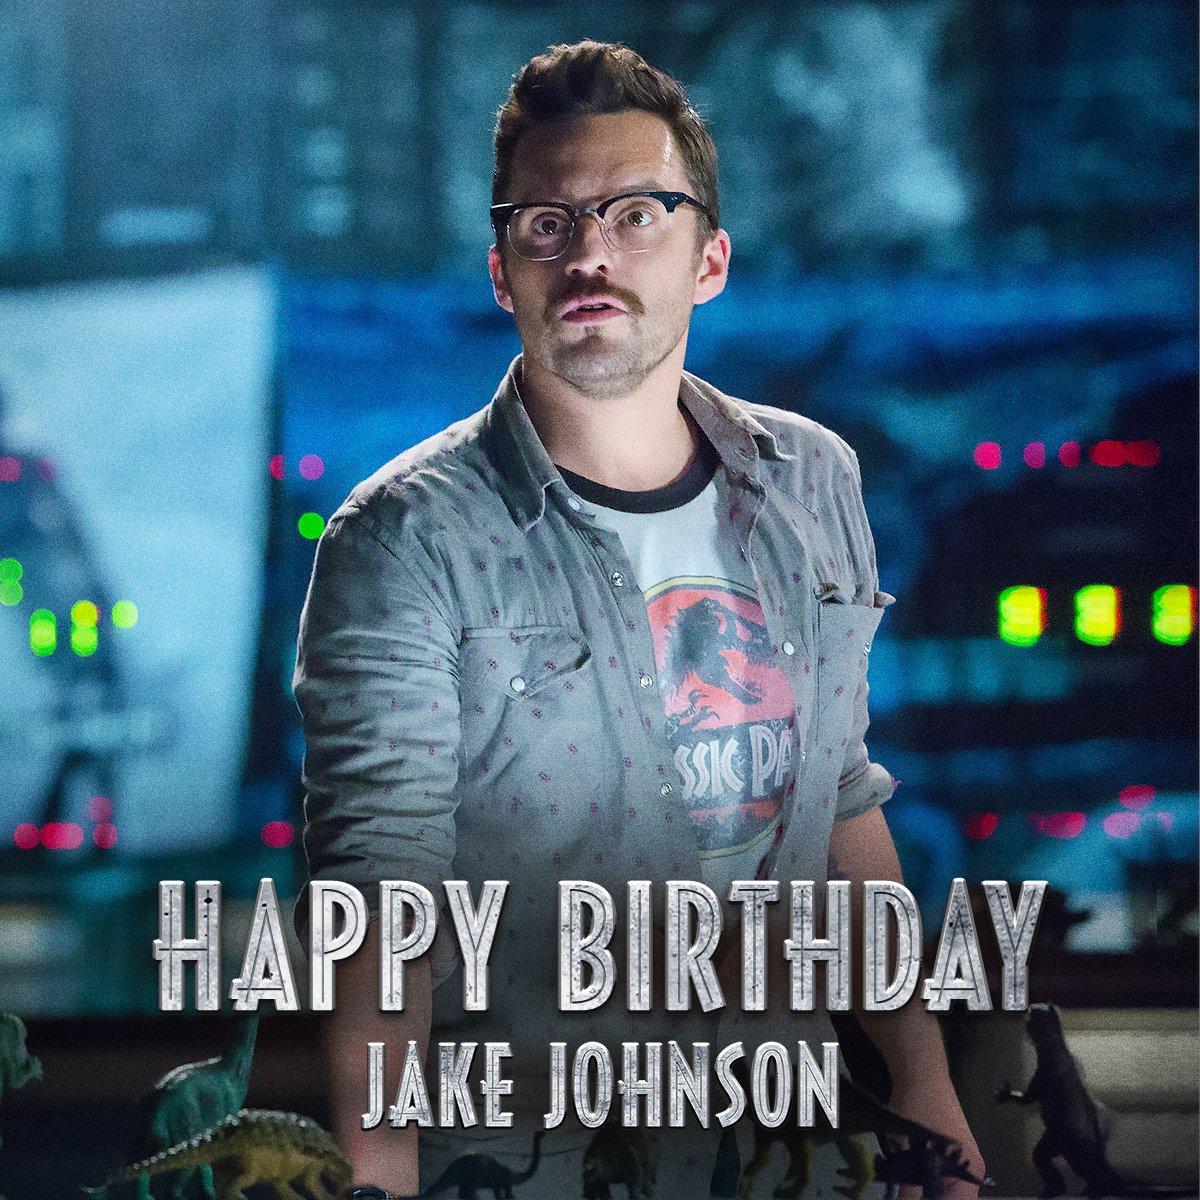 Happy birthday, Jake Johnson! Where'd you get the T-shirt?